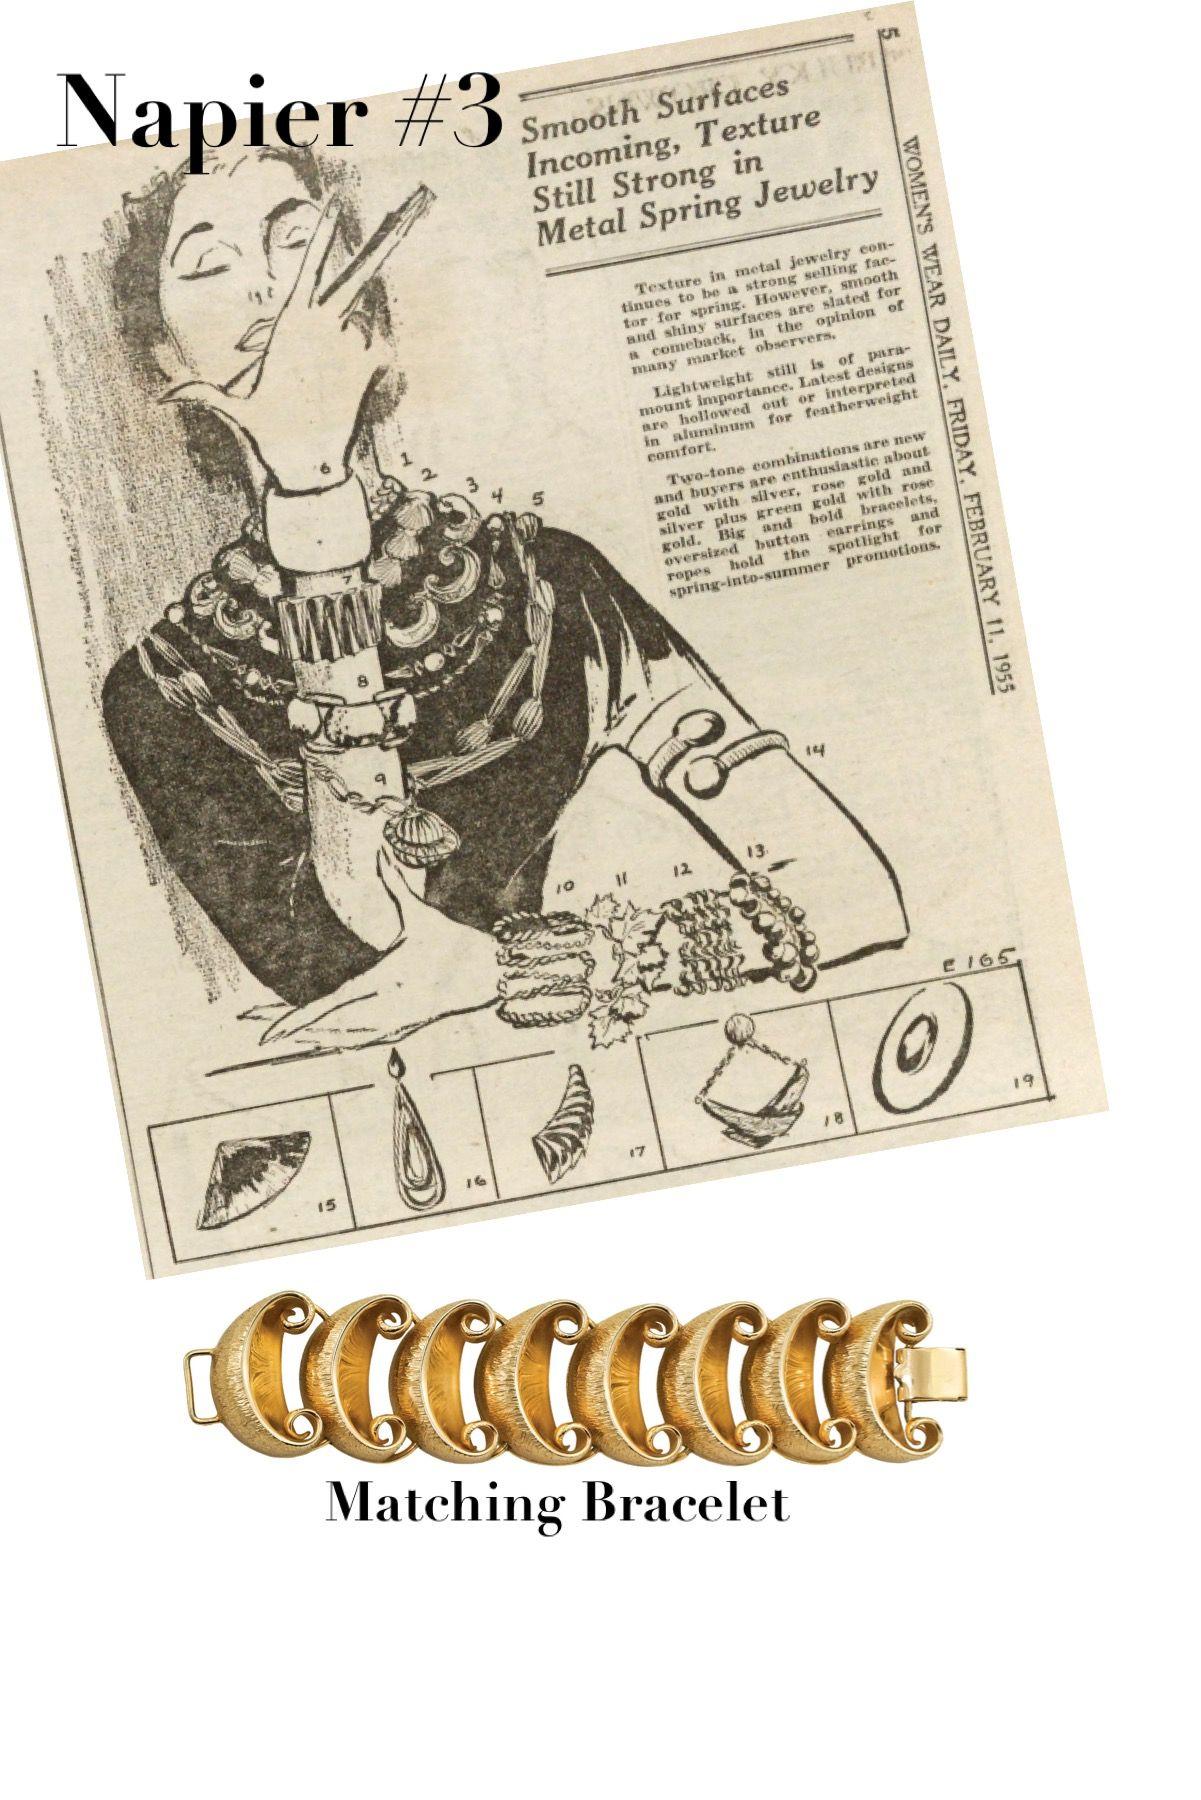 Napier Jewelry Featured in WWD 1955.